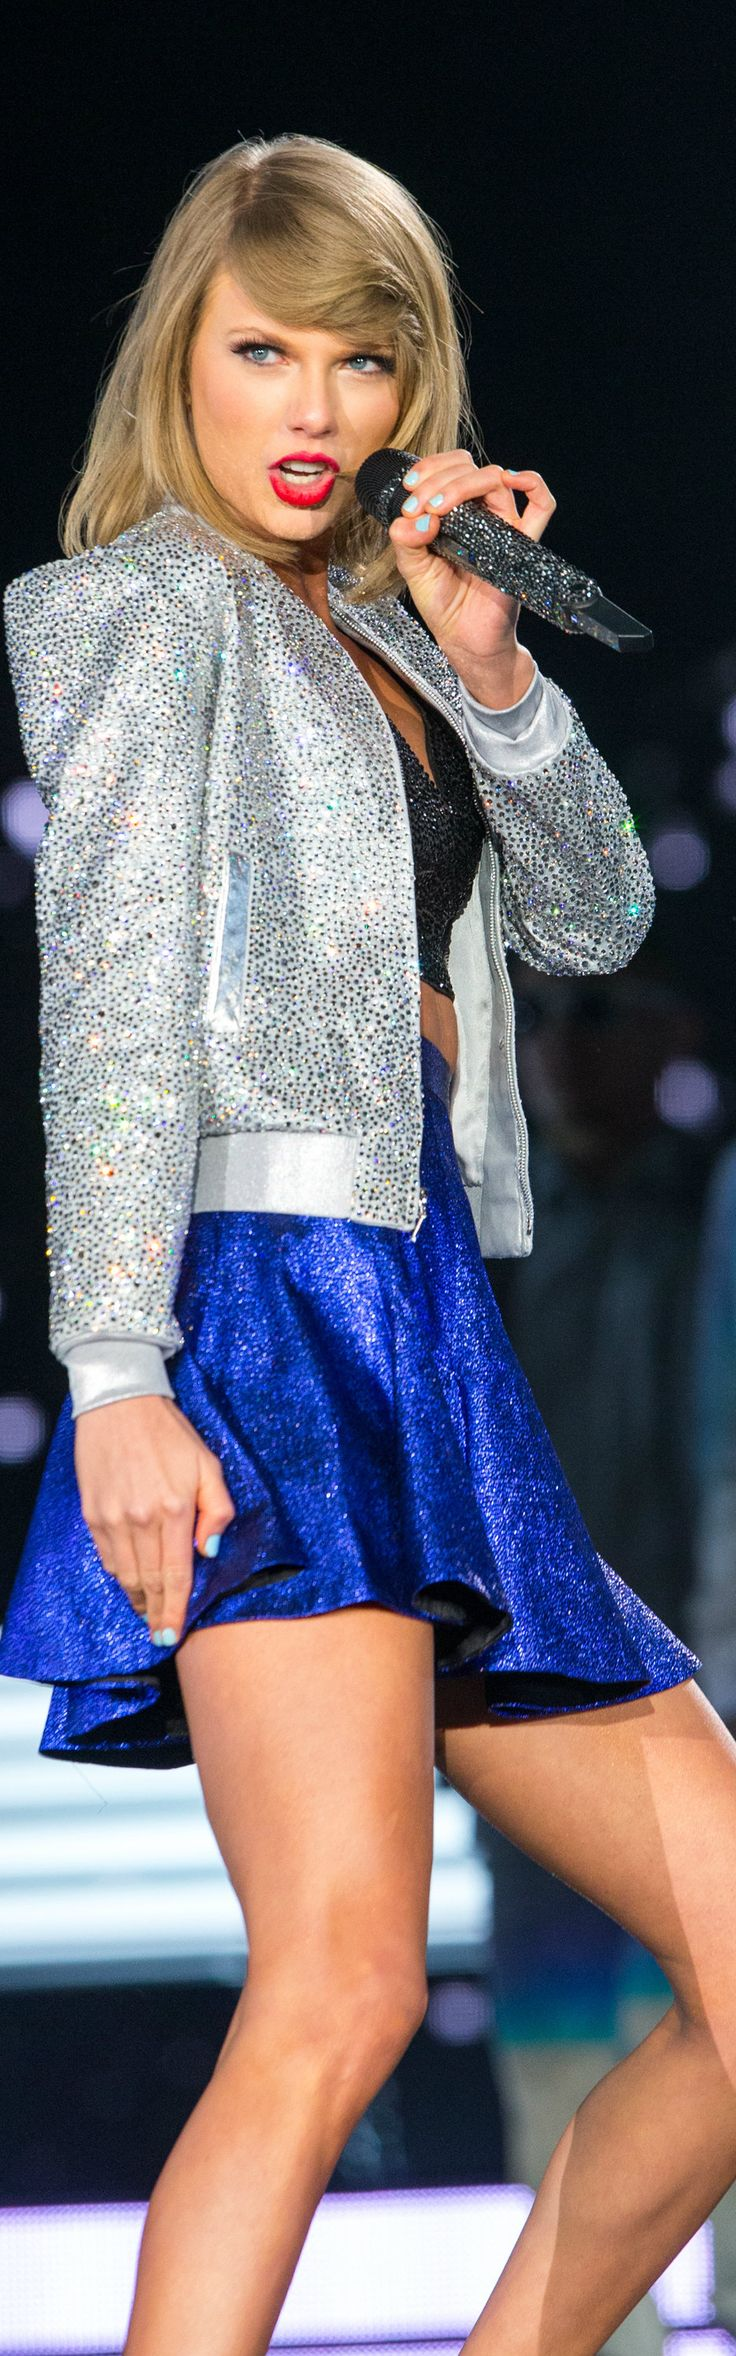 Taylor Swift | Rock In Rio in Las Vegas, Nevada - May 15, 2015